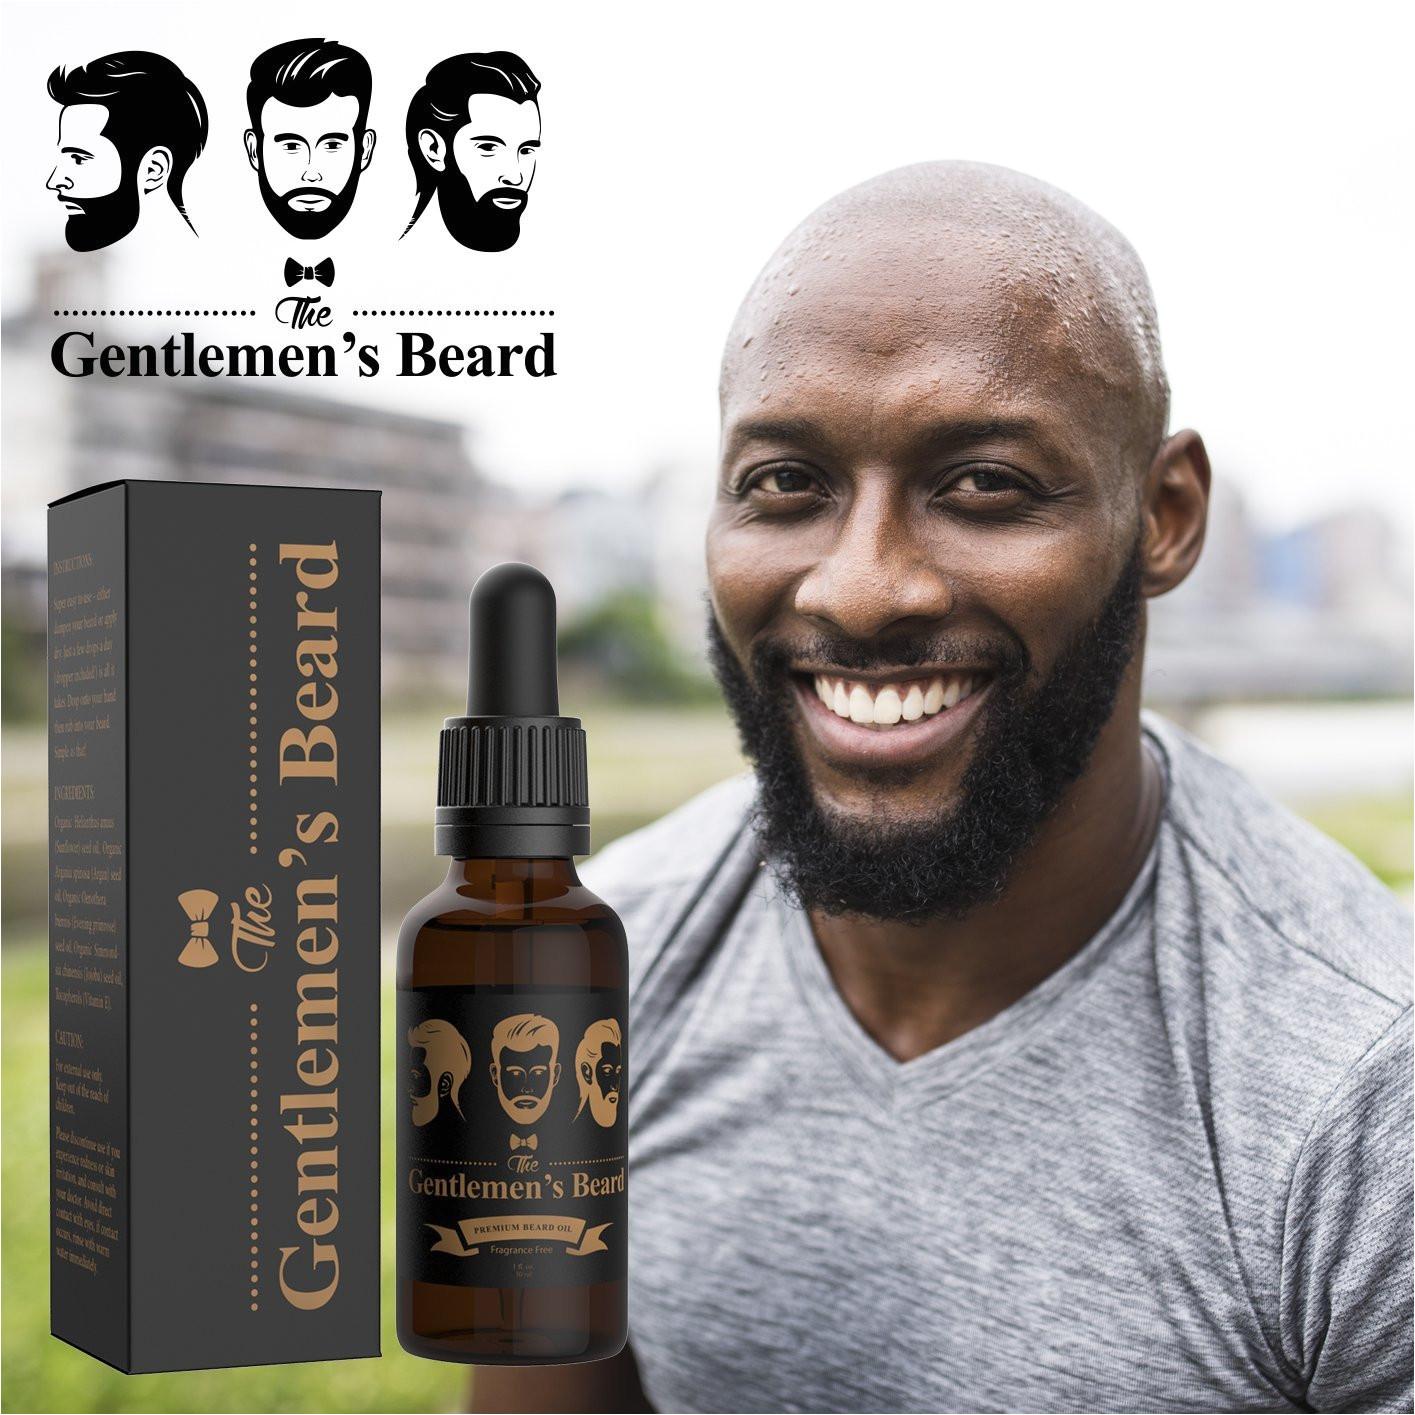 How to Make Beard Hair soft Like Head Hair Amazon Com the Gentlemen S Beard Premium Beard Oil Leave In